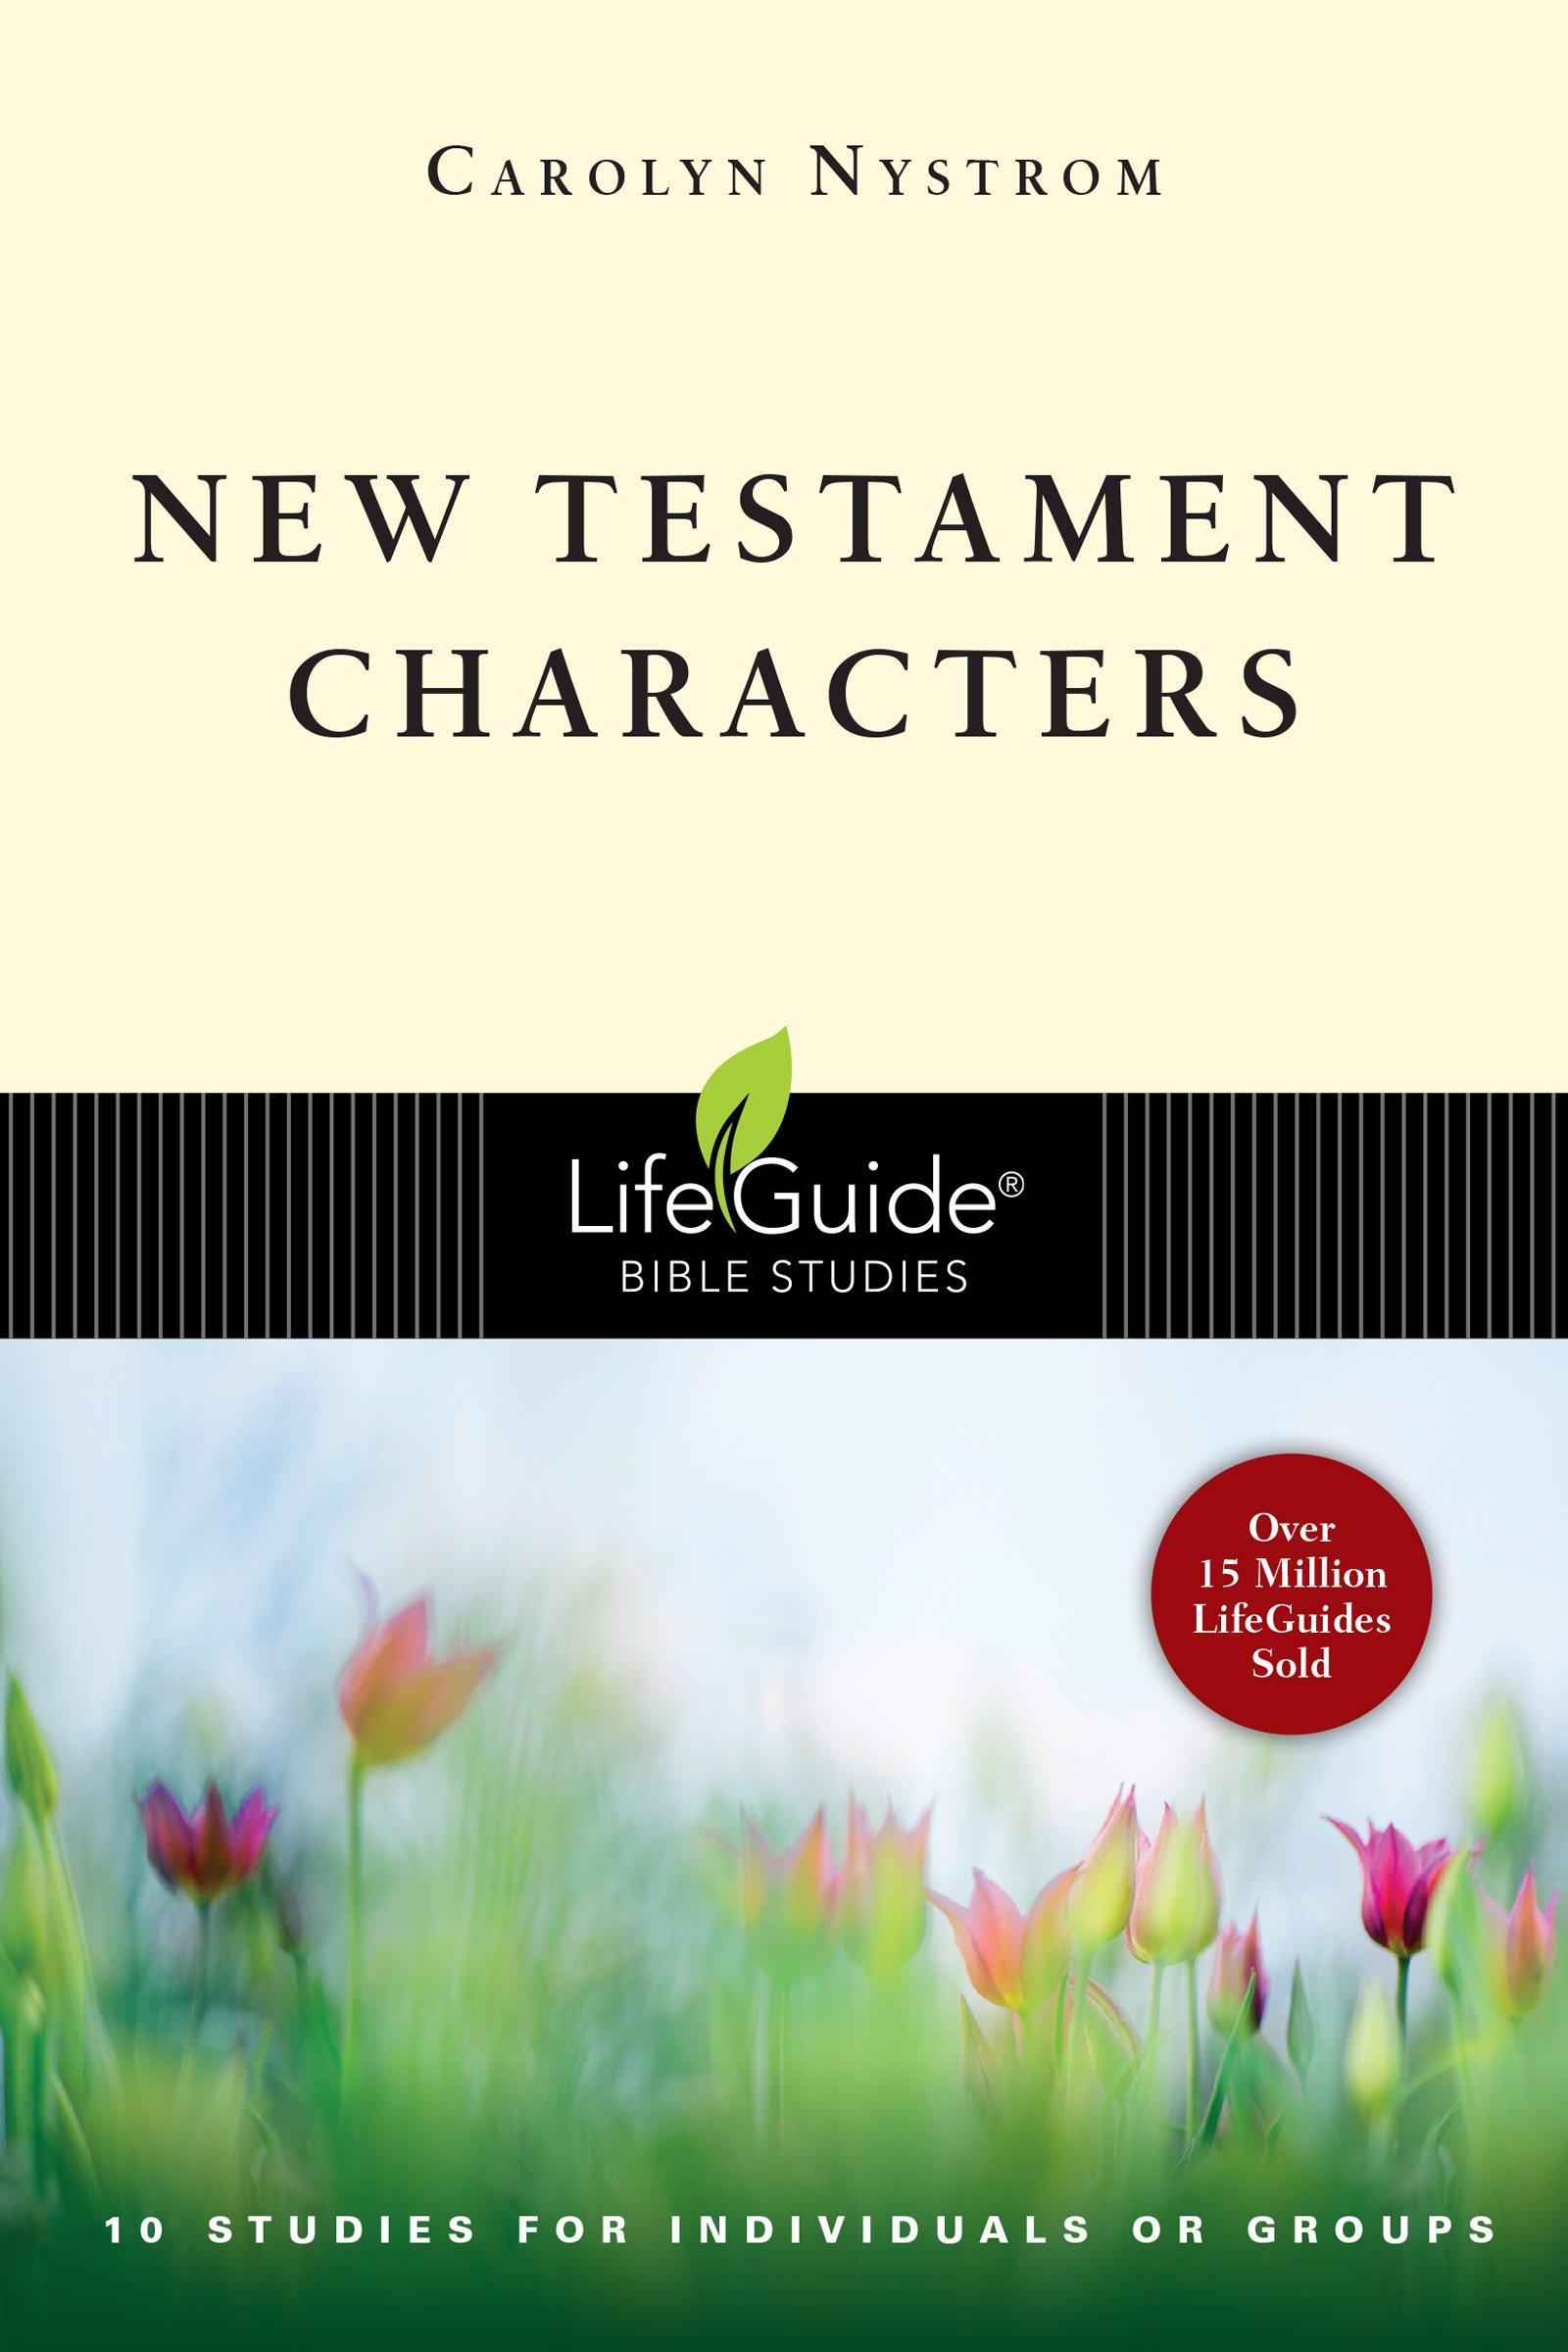 New Testament Characters (Lifeguide Bible Studies) pdf